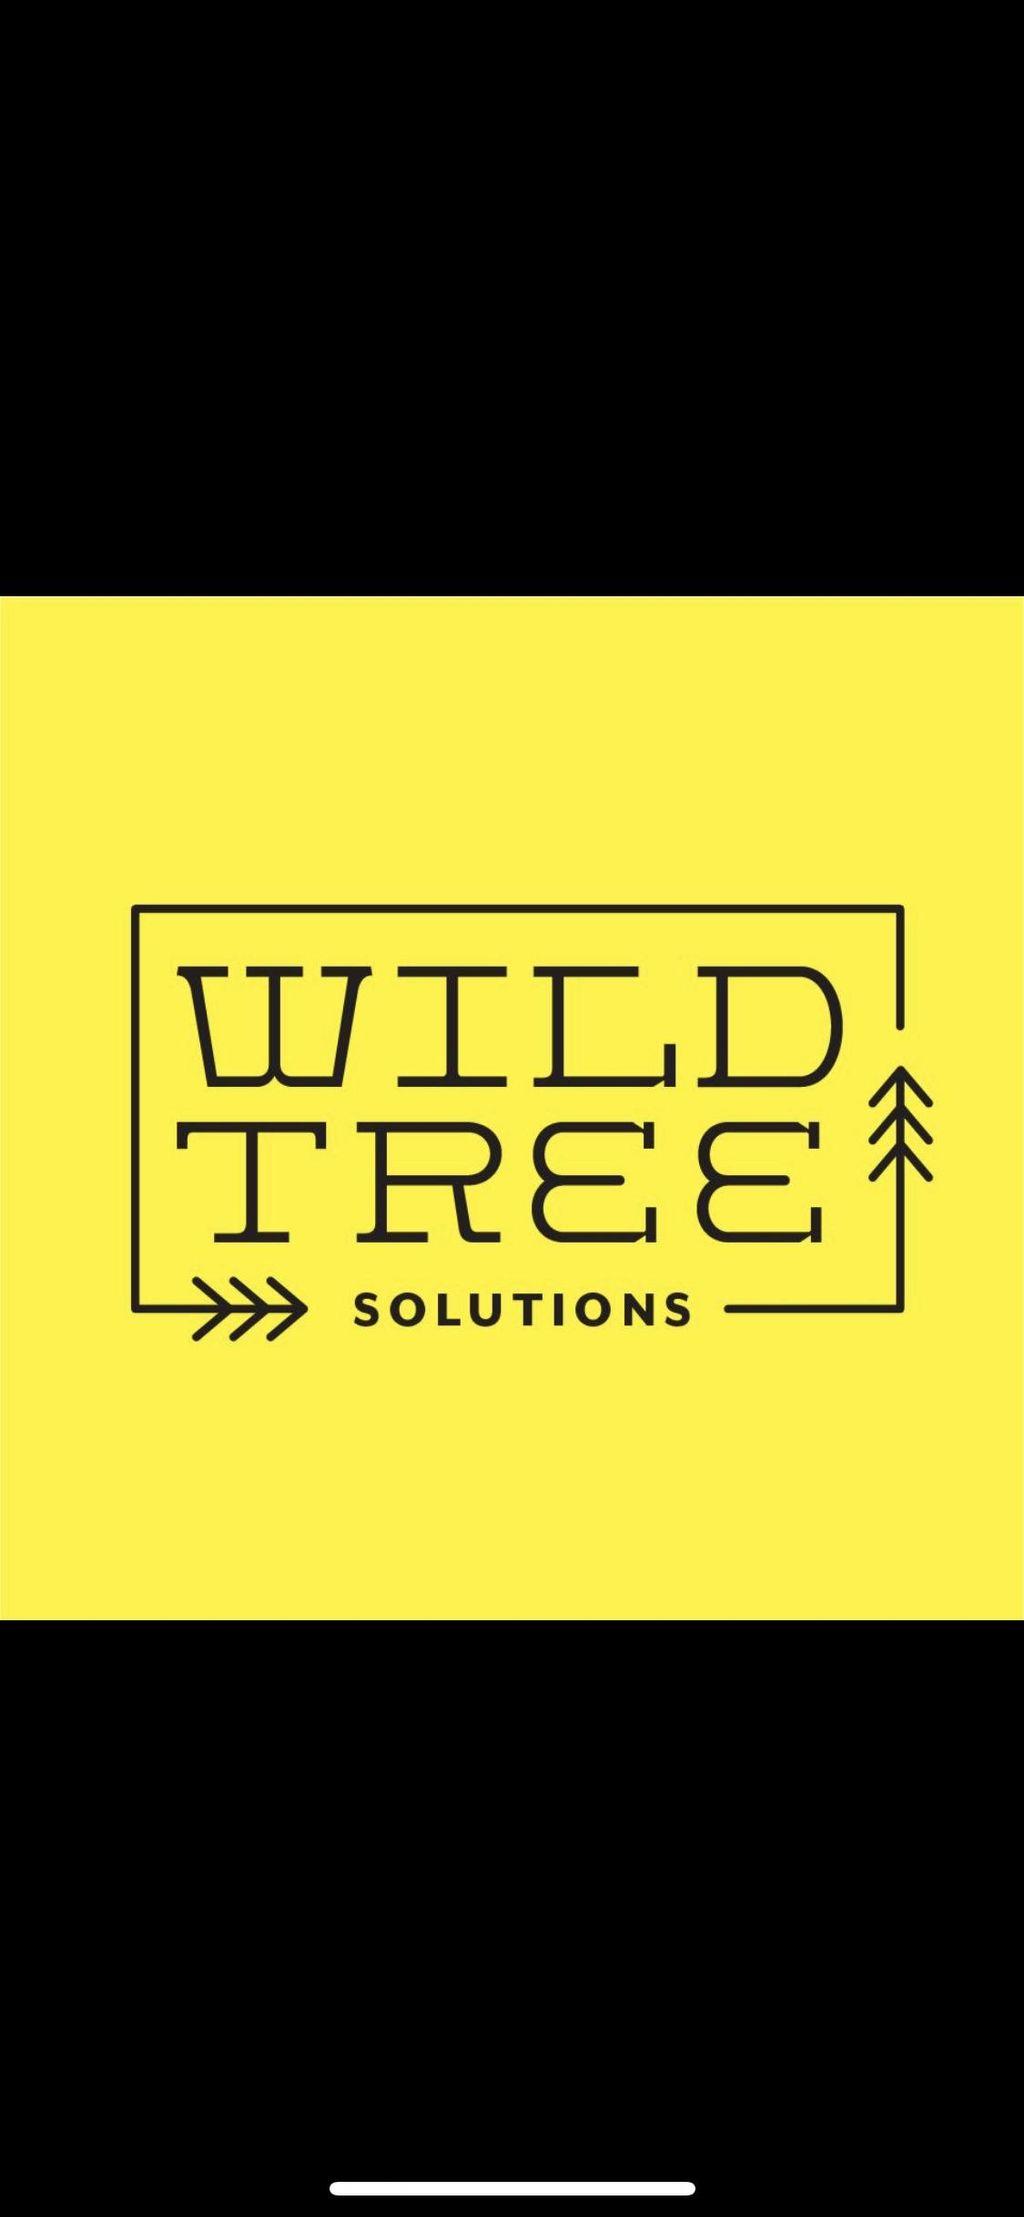 Wild Tree Solutions LLC